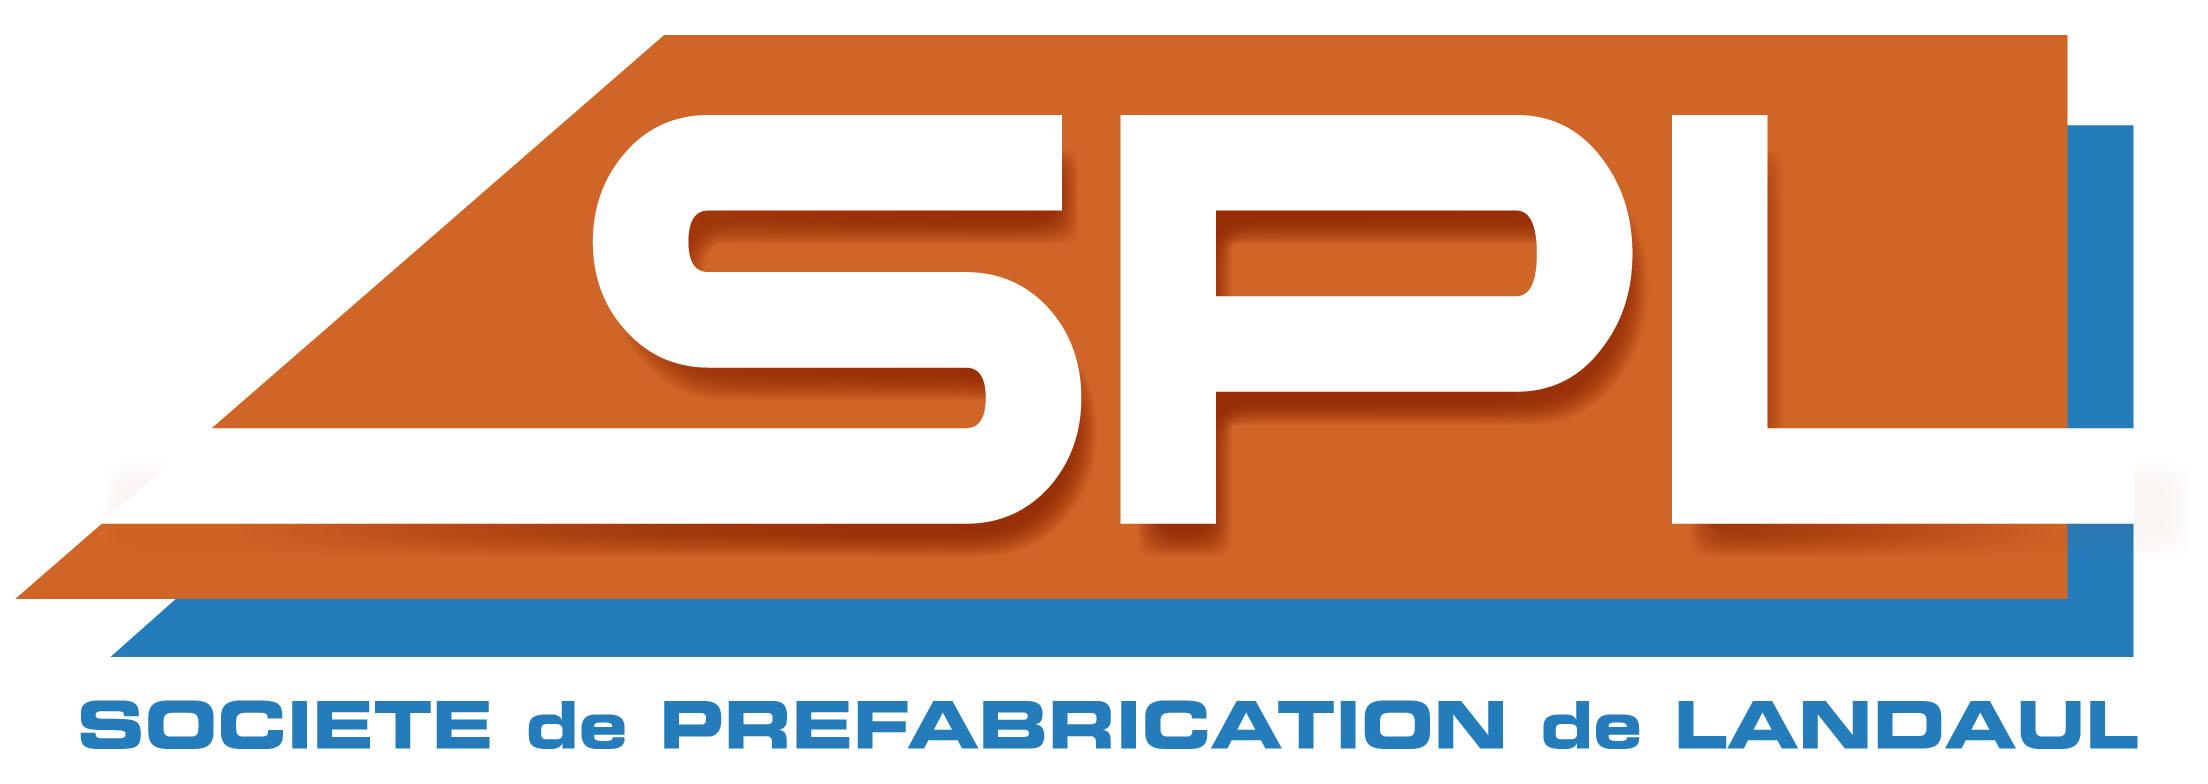 SPL – SOCIETE DE PREFABRICATION DE LANDAUL